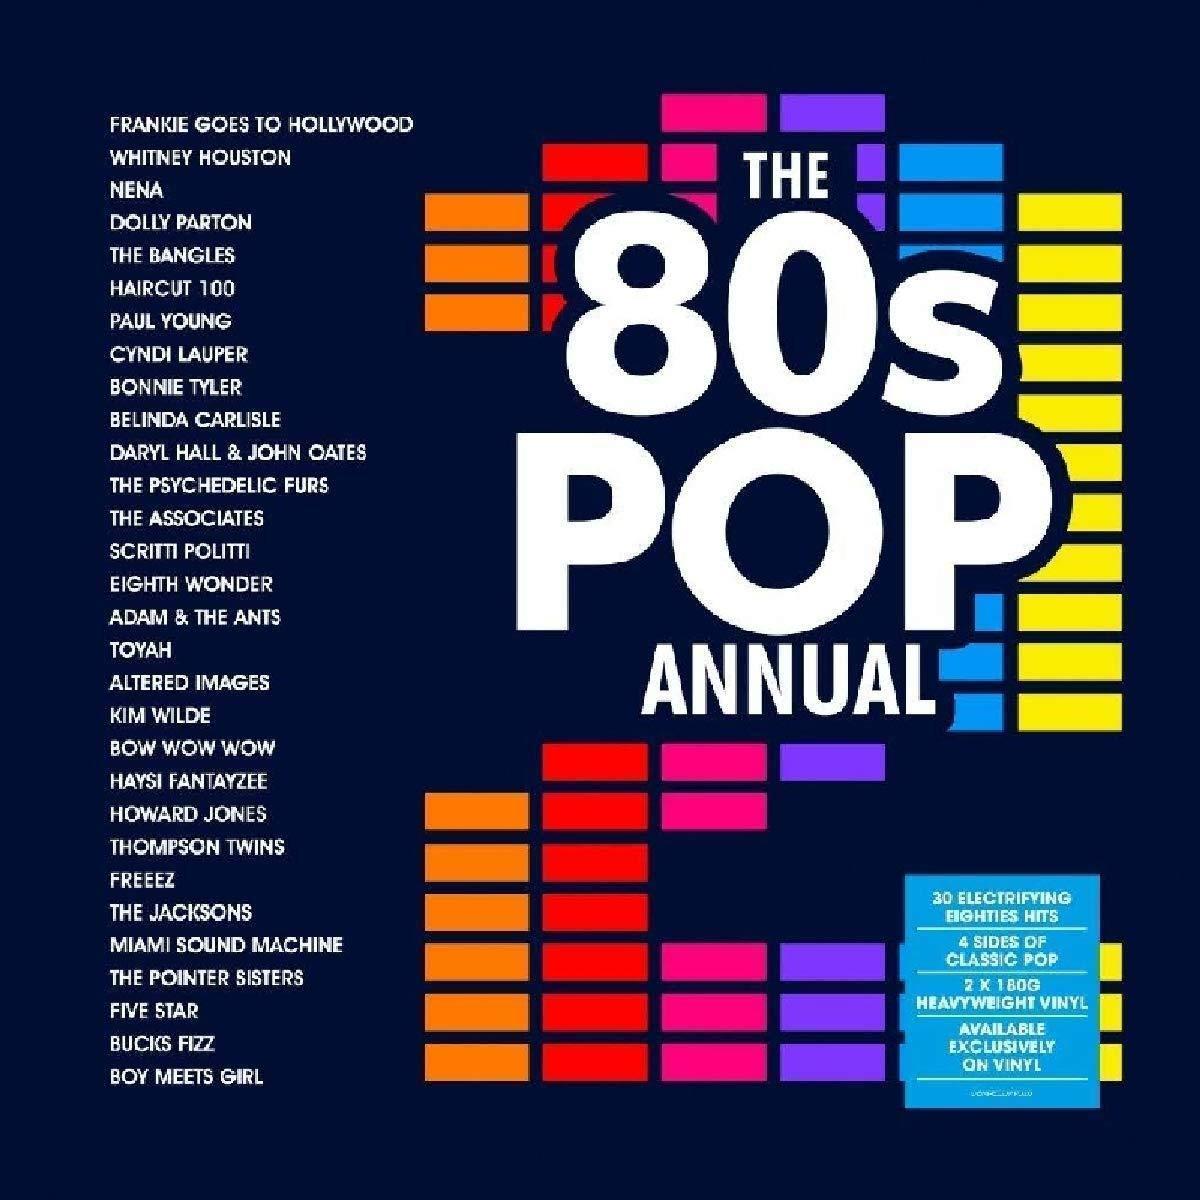 £9.99 (Prime) £12.98 (Non Prime) 80's Pop Annual Vinyl on Amazon.